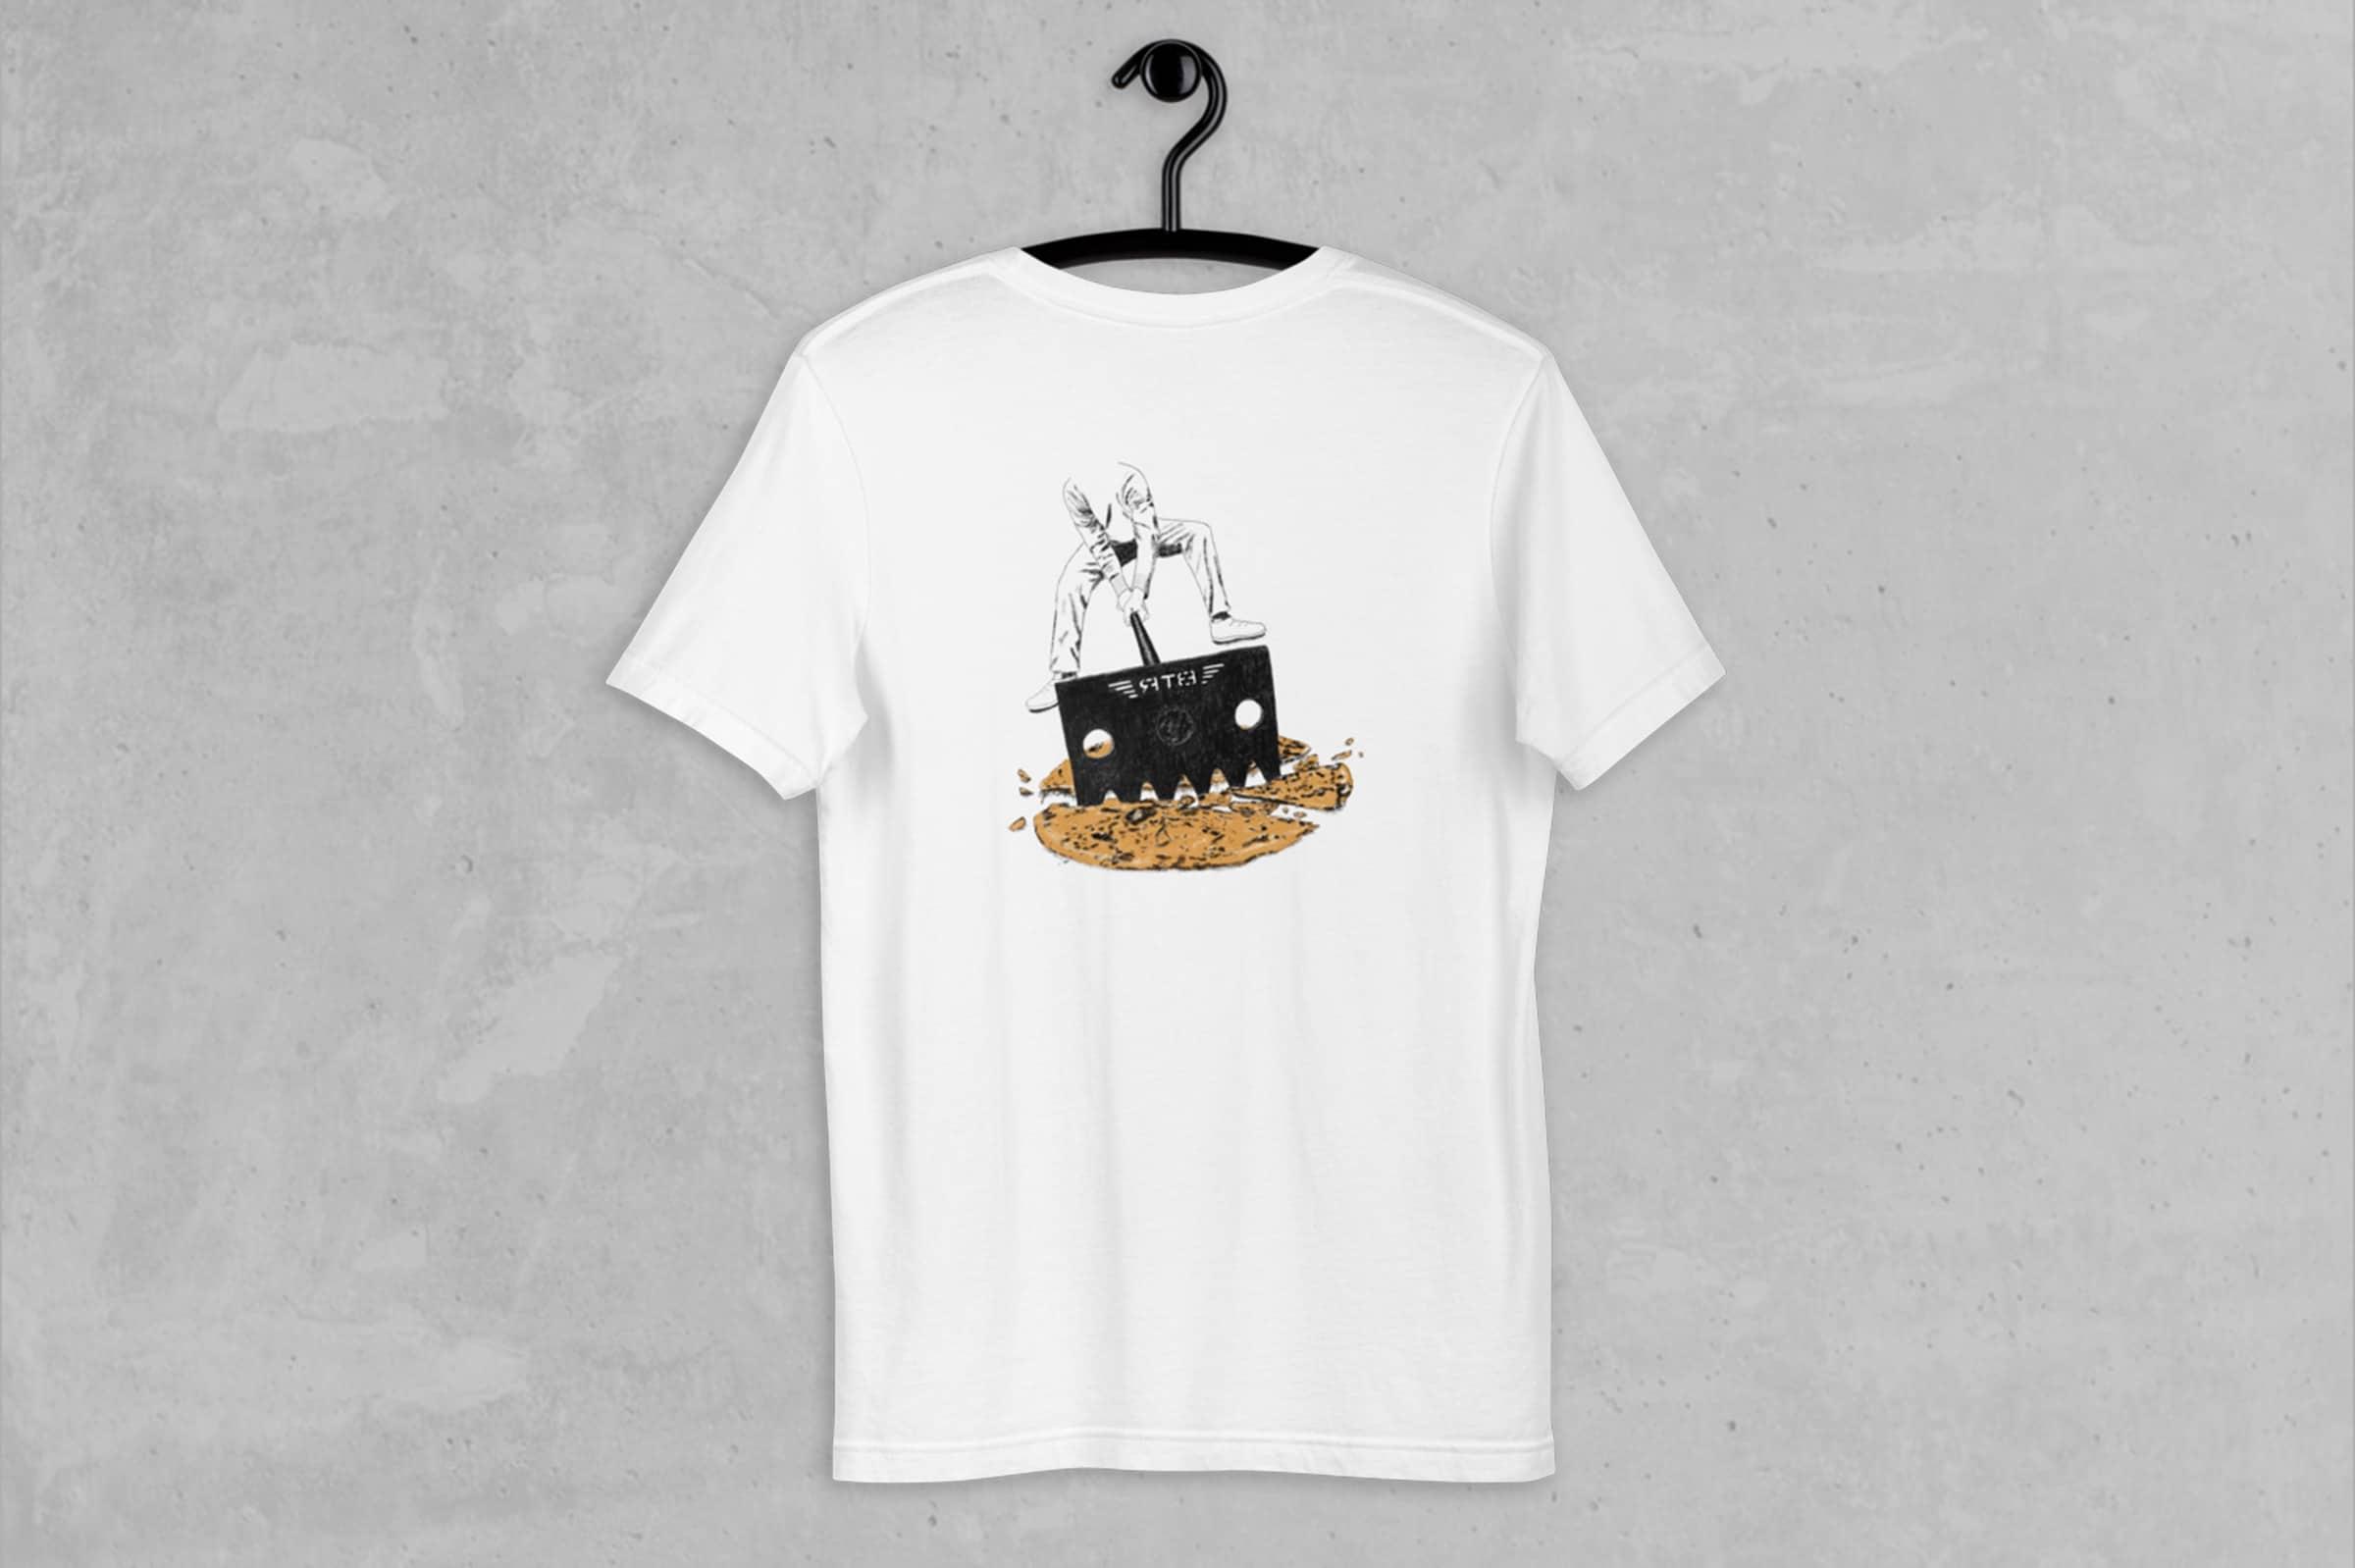 BTR + Tea & Biscuits T-shirt